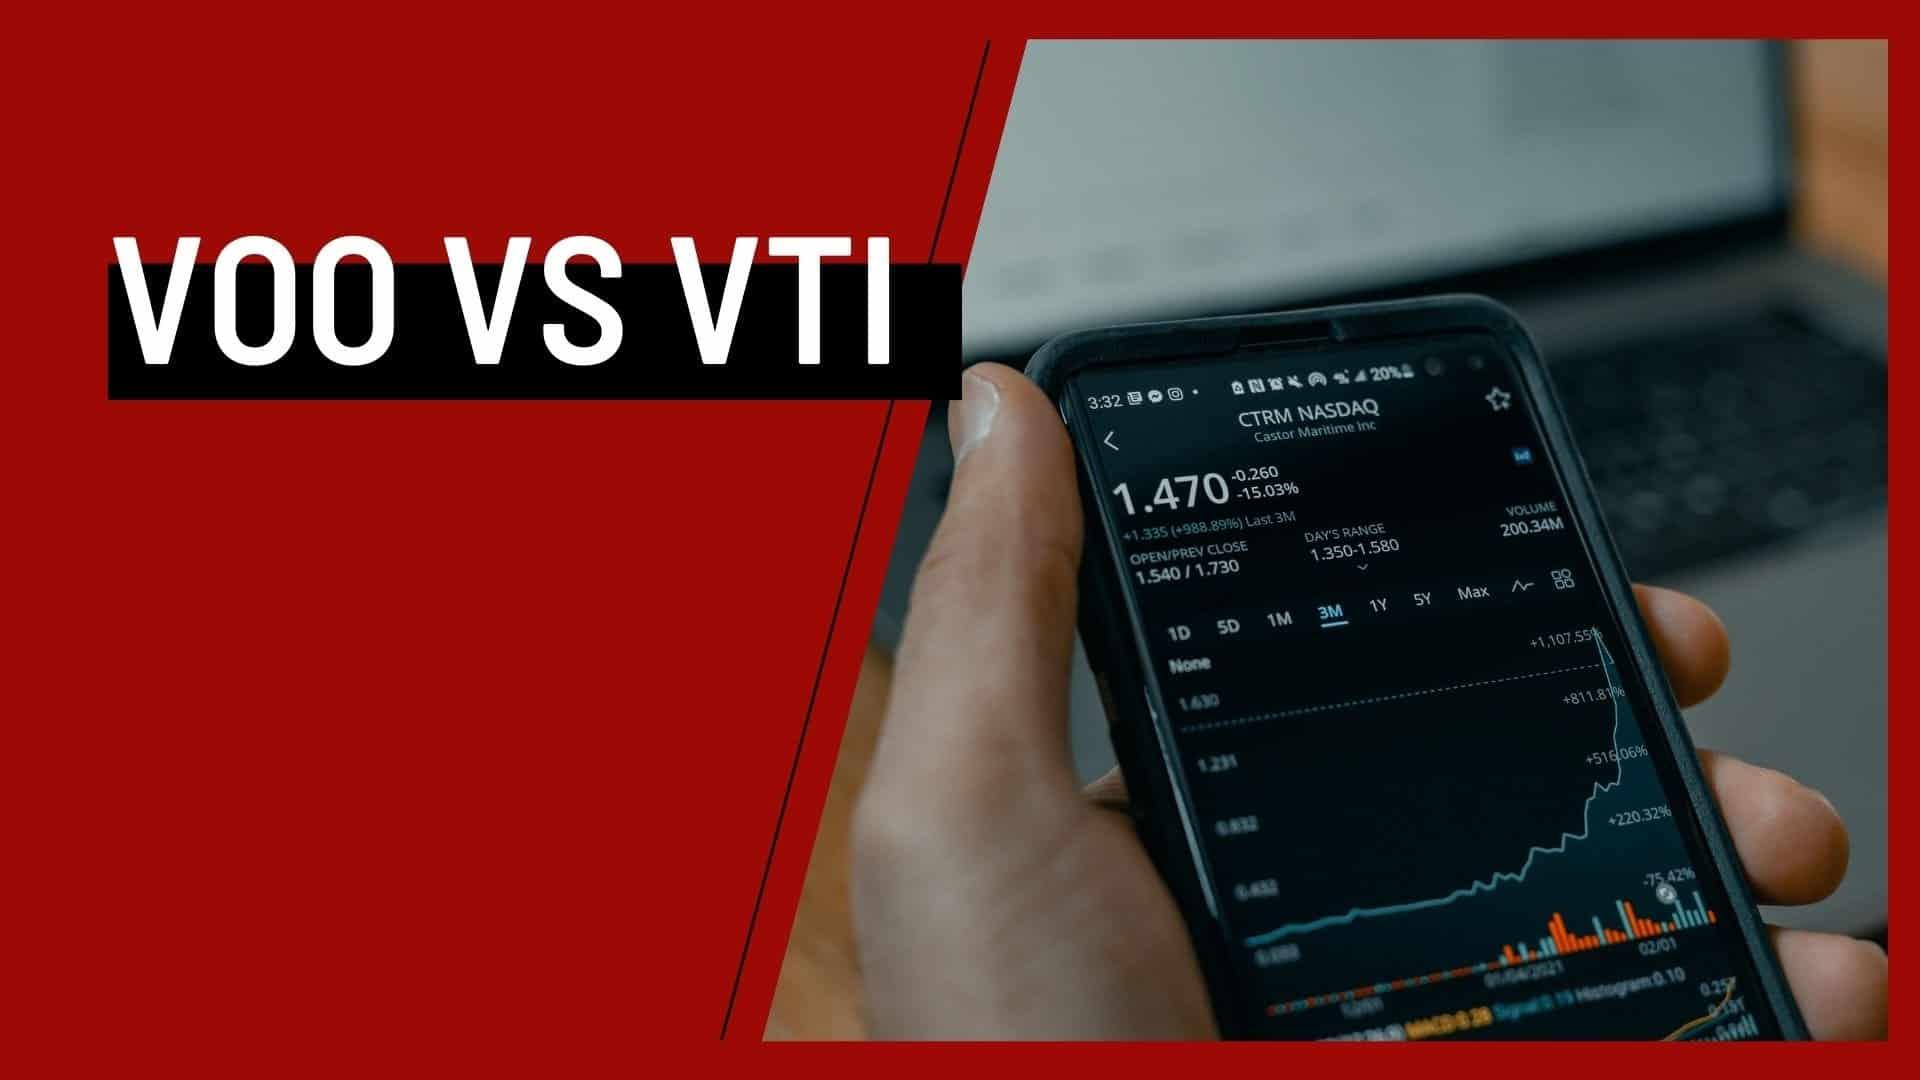 VOO vs VTI